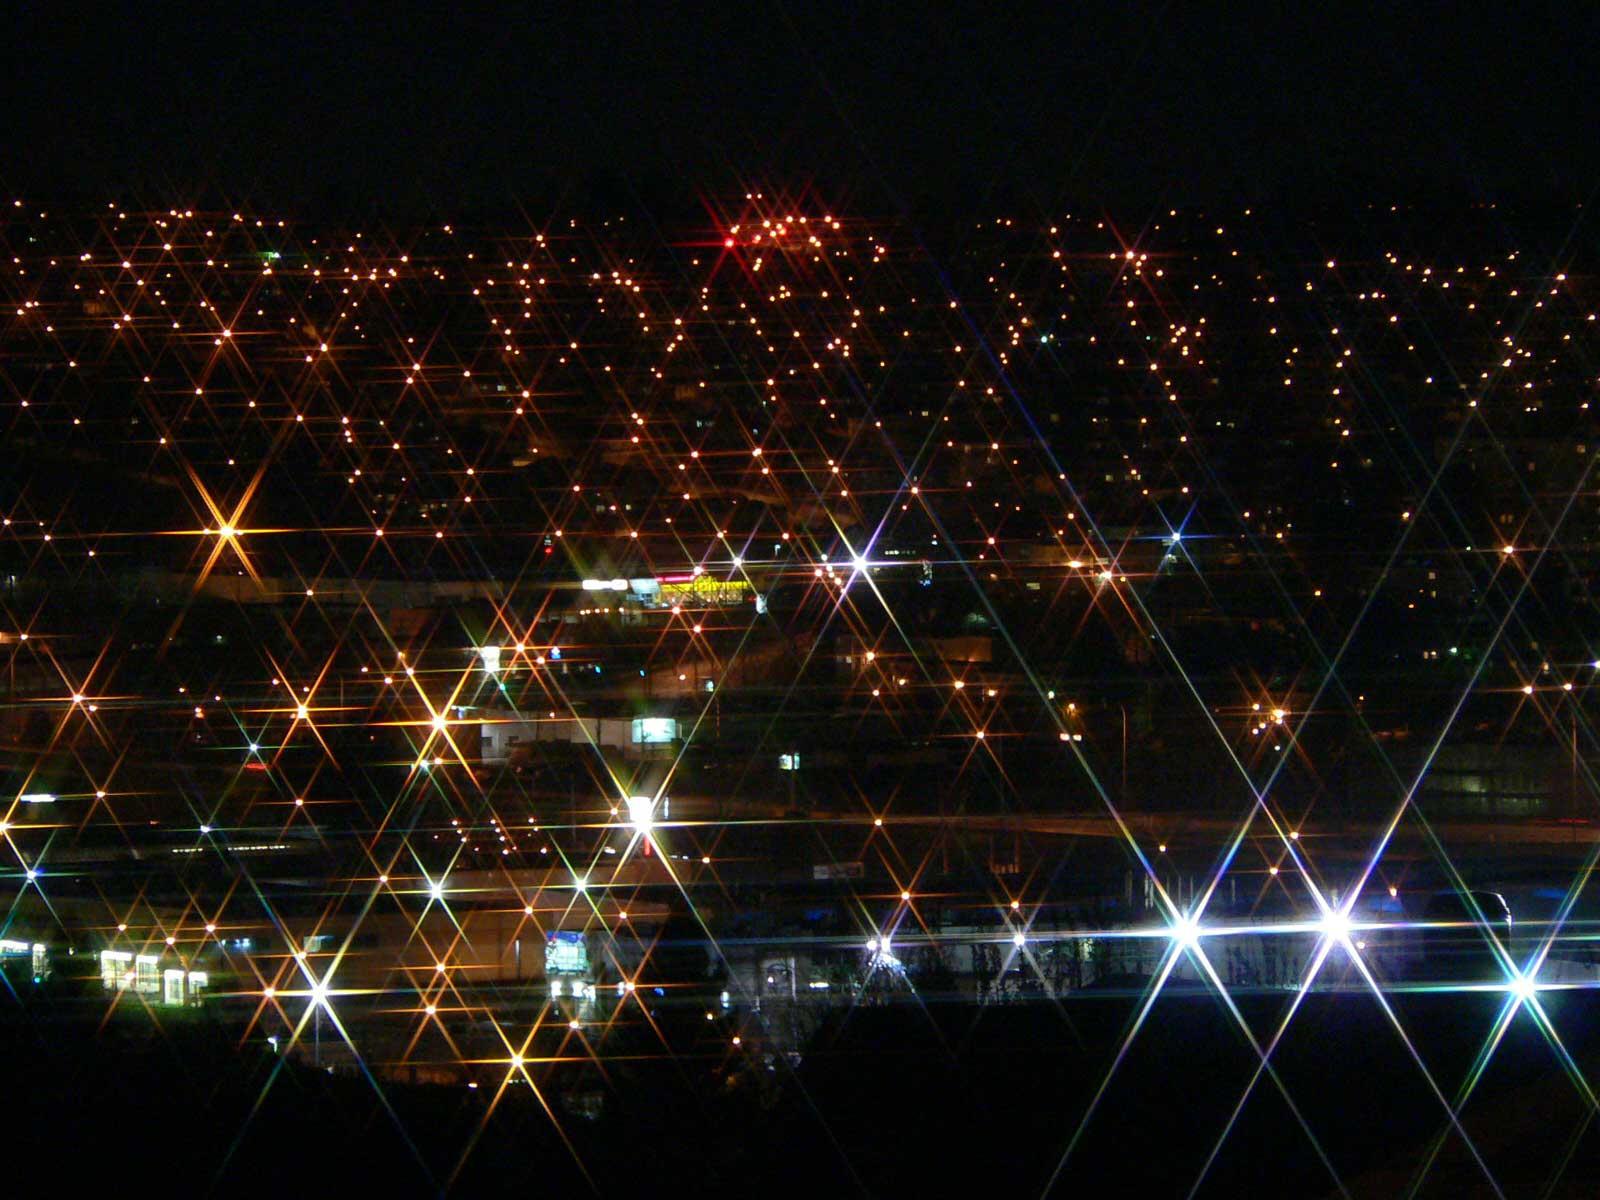 City at night city of light by boobootoo on deviantart - Licht nightclub ...